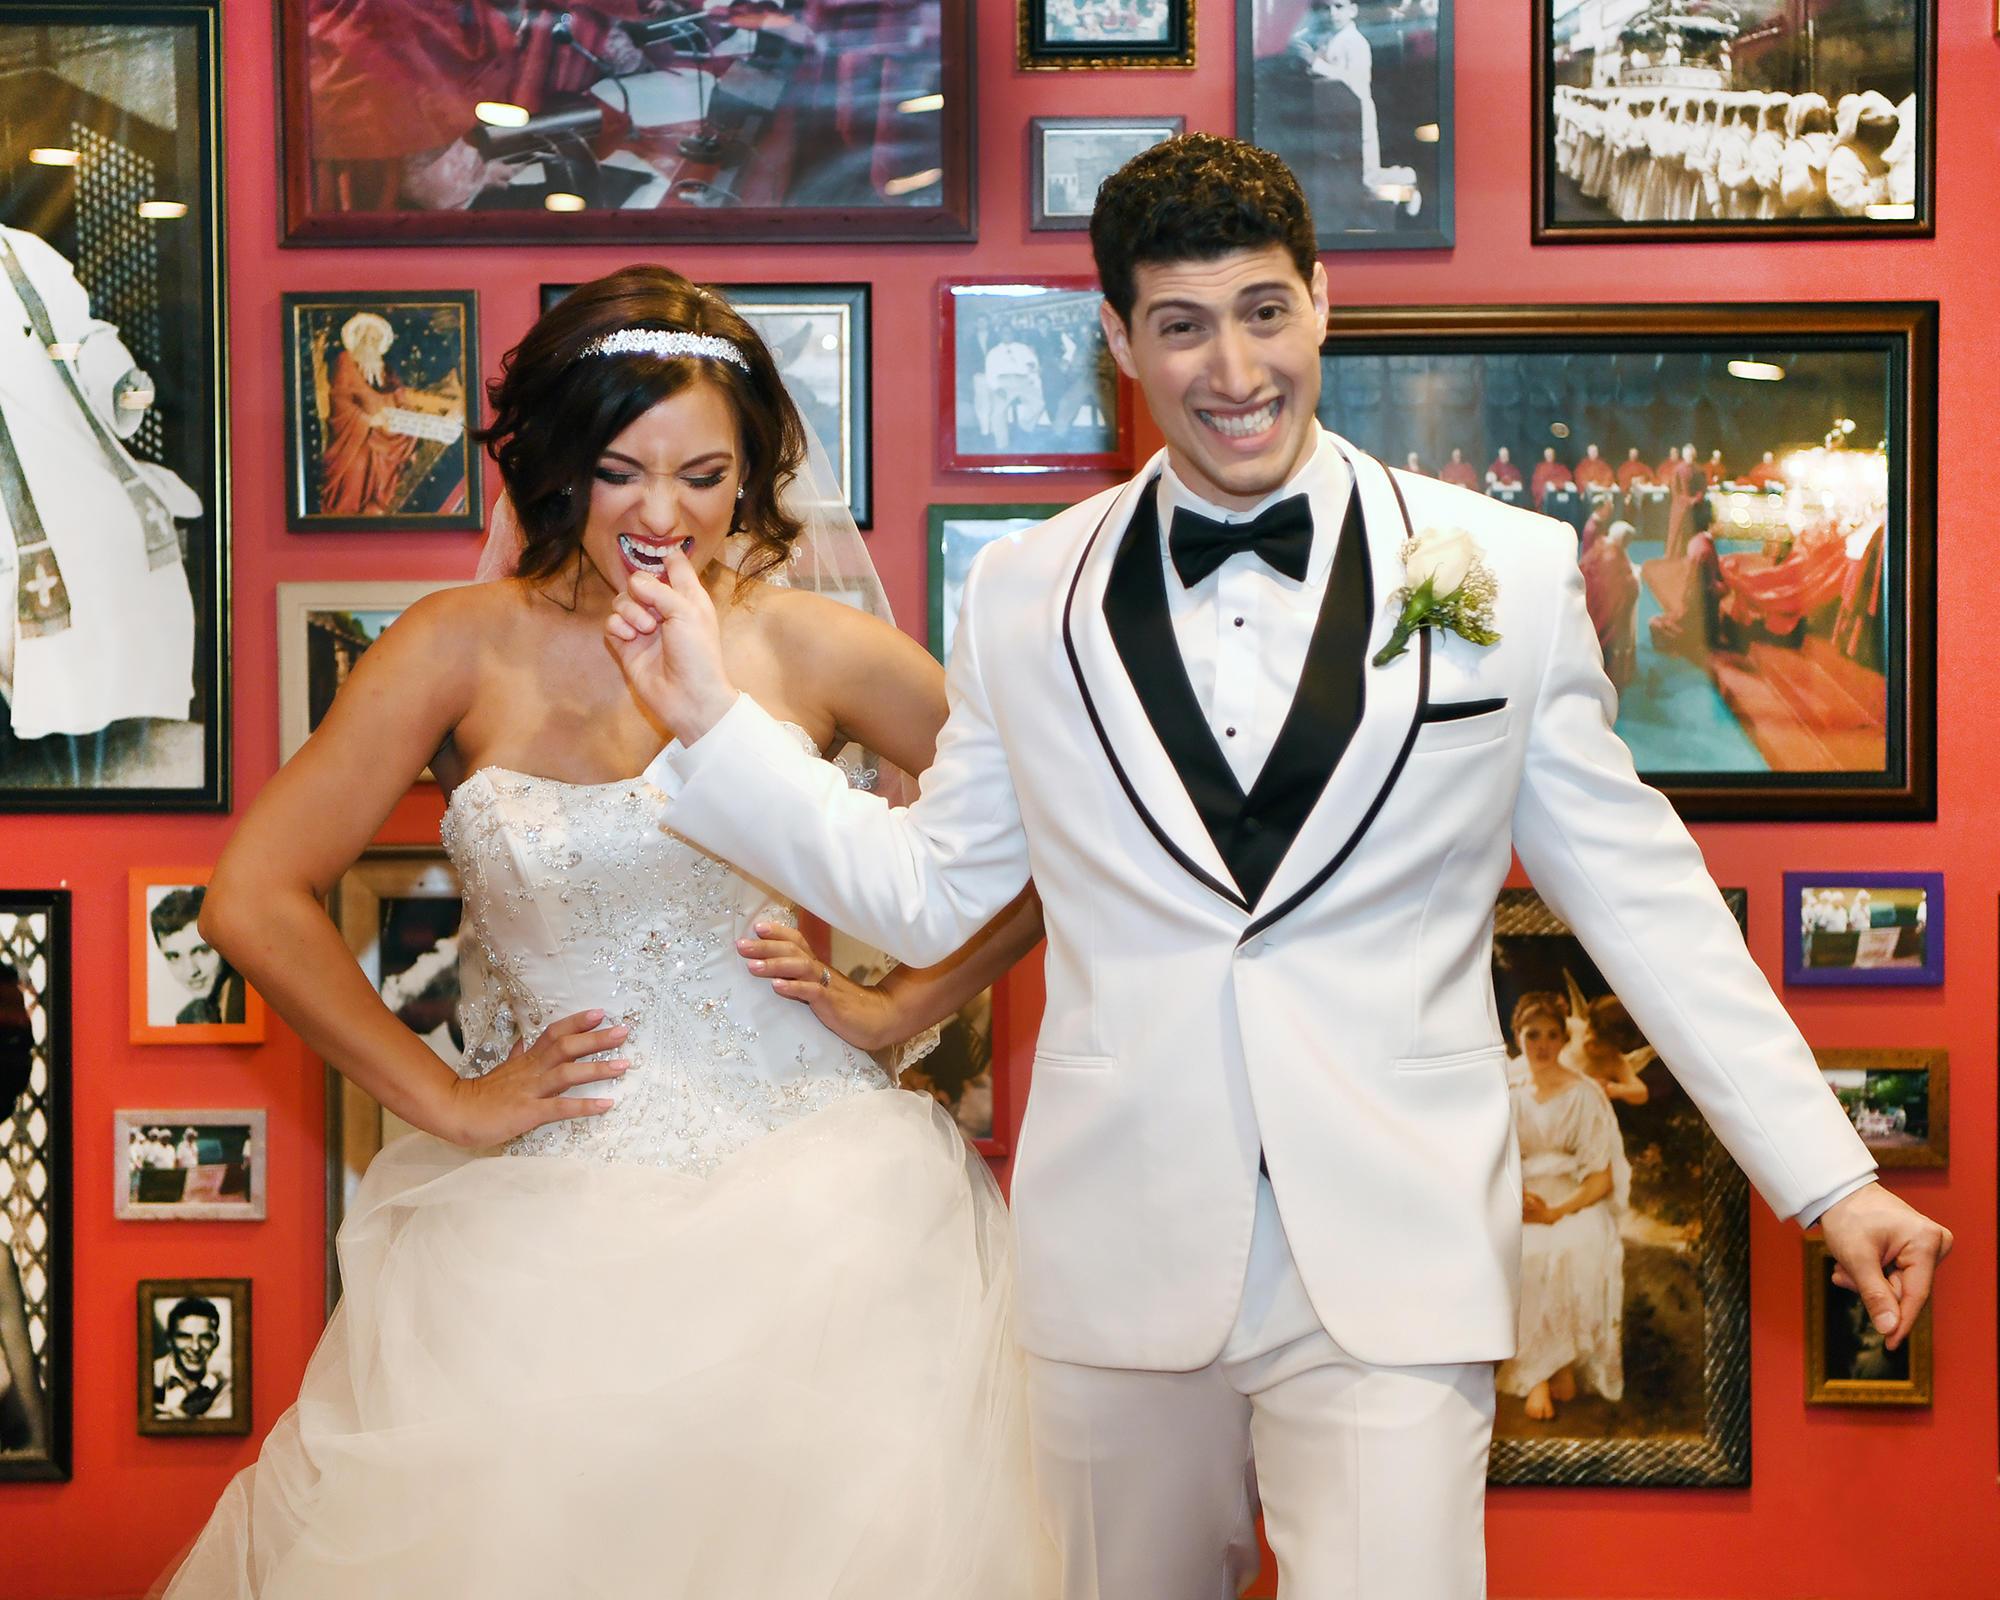 Tony N' Tina's Wedding image 3